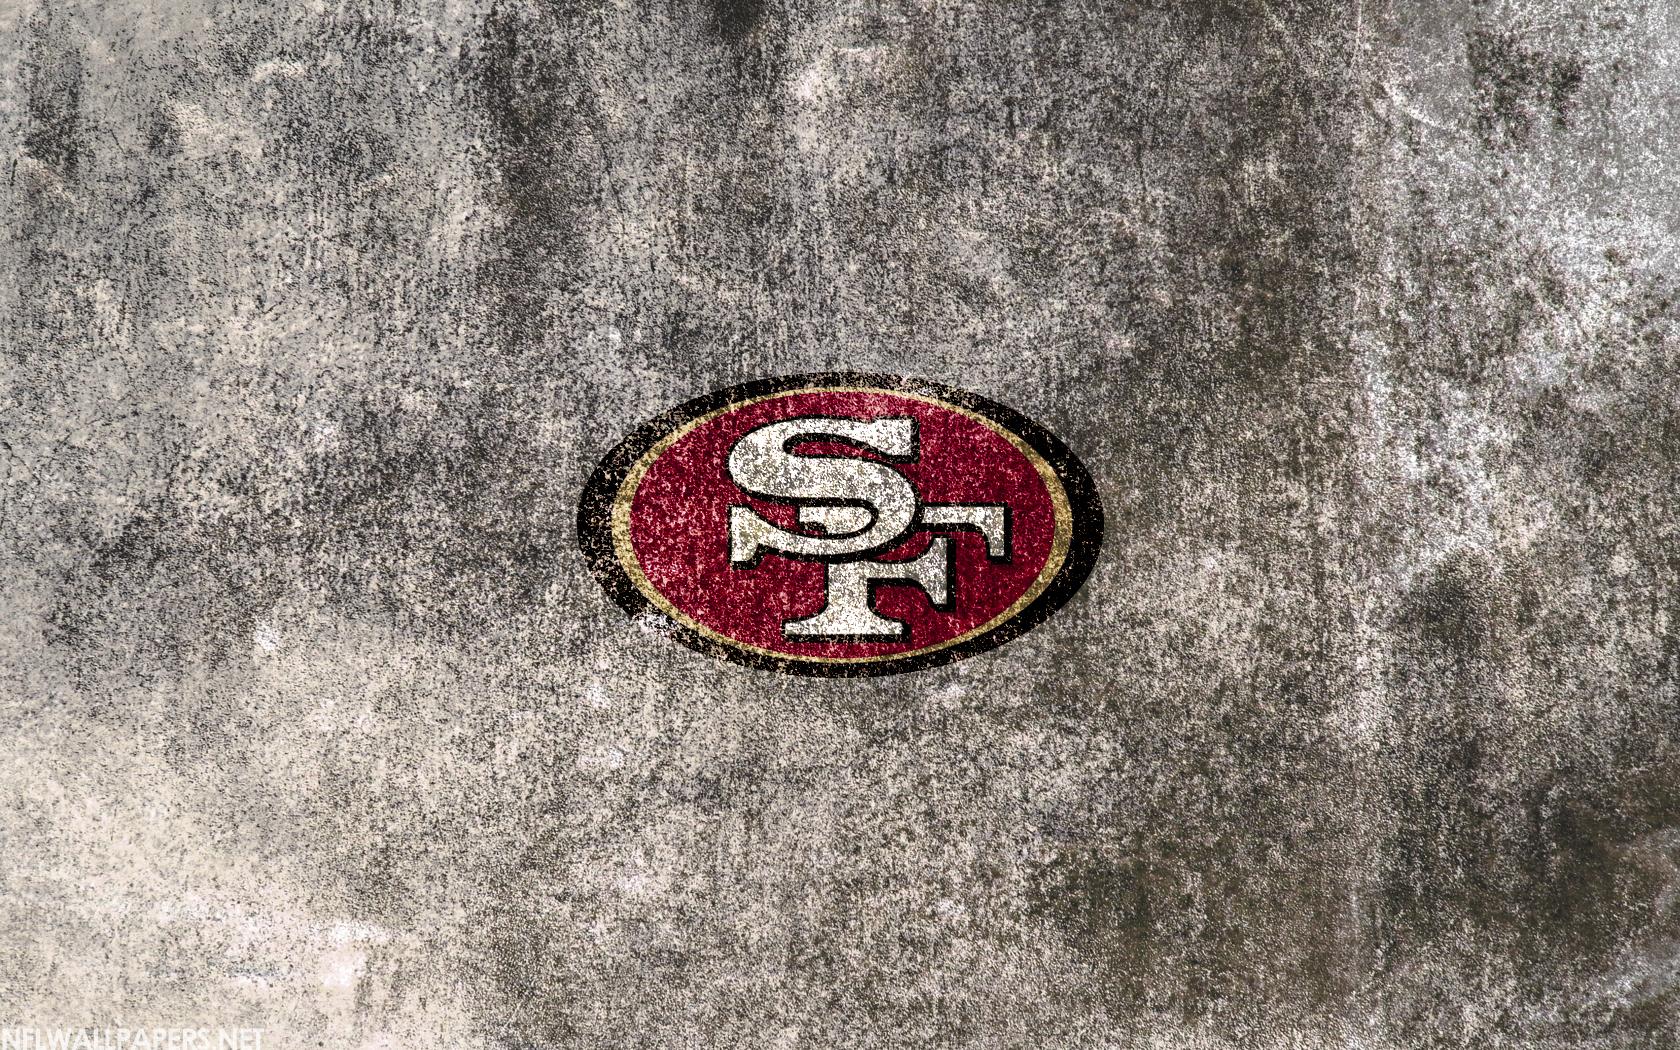 Hd wallpaper zone - San Francisco 49ers Wallpaper Hd Background San Francisco 49ers